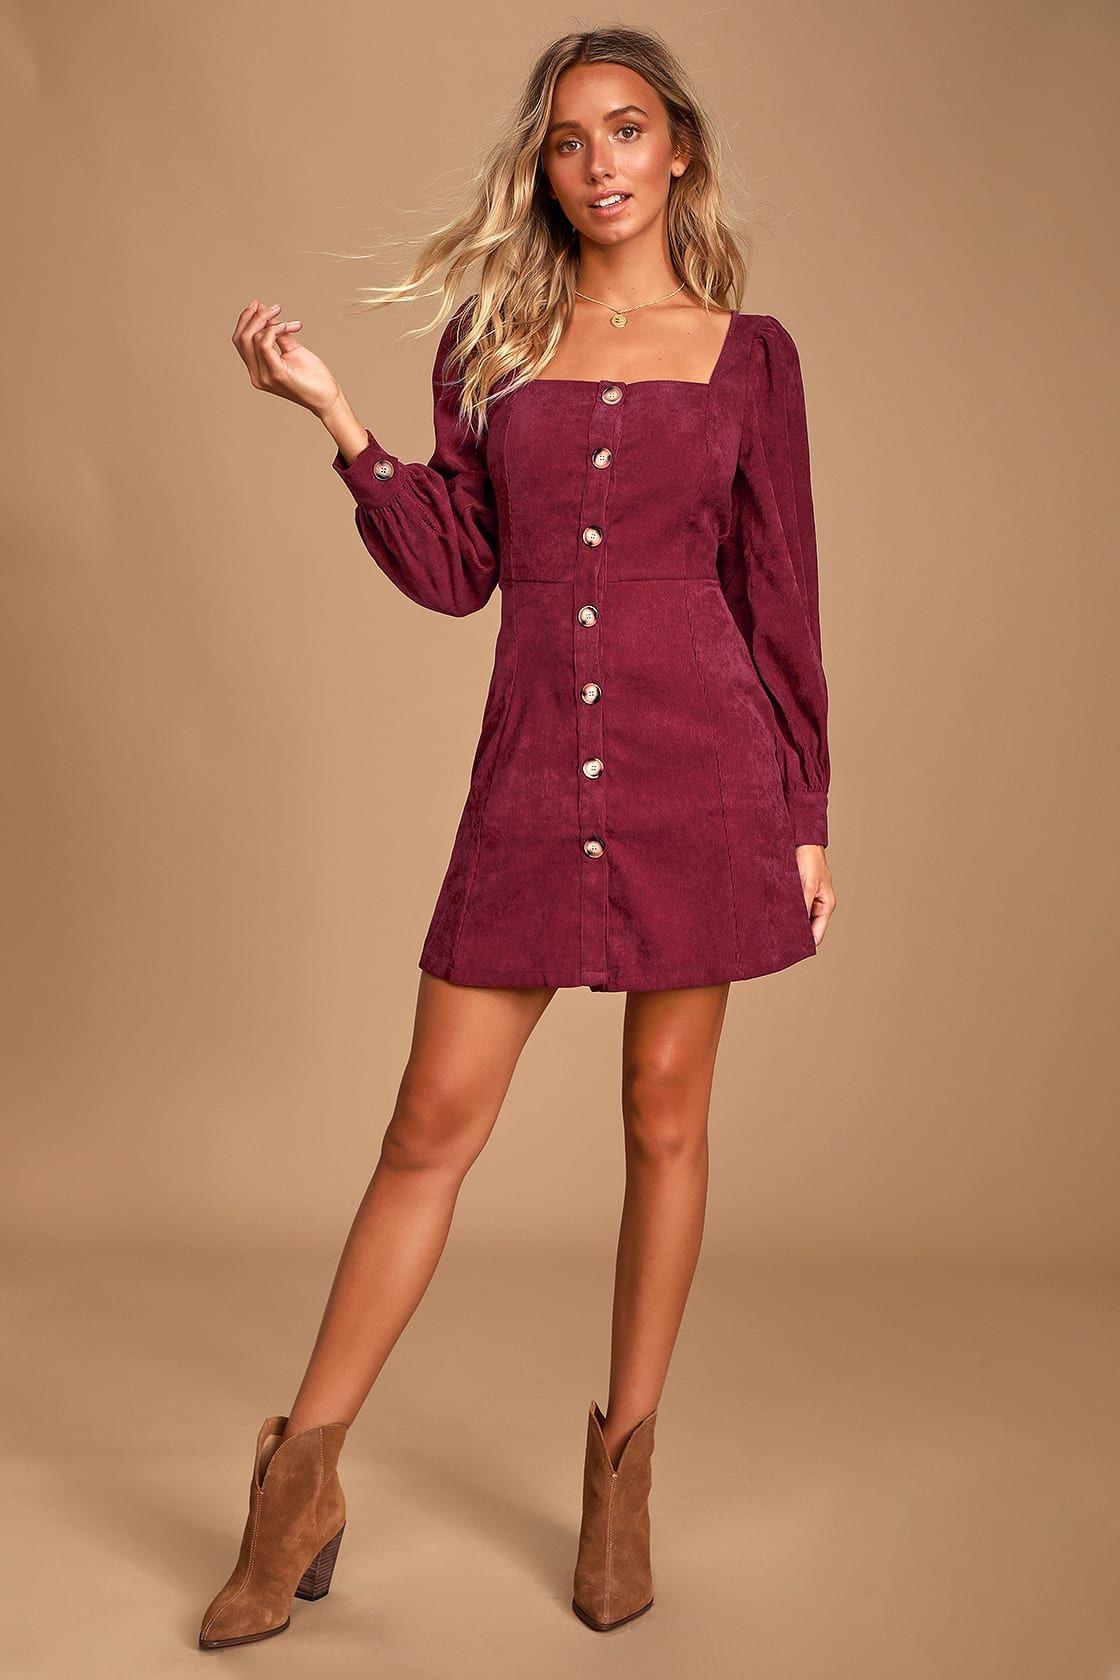 Amabelle Burgundy Corduroy Long Sleeve Button Up Mini Dress Long Sleeve Burgundy Dress Mini Dress Long Sleeve Dress [ 1680 x 1120 Pixel ]